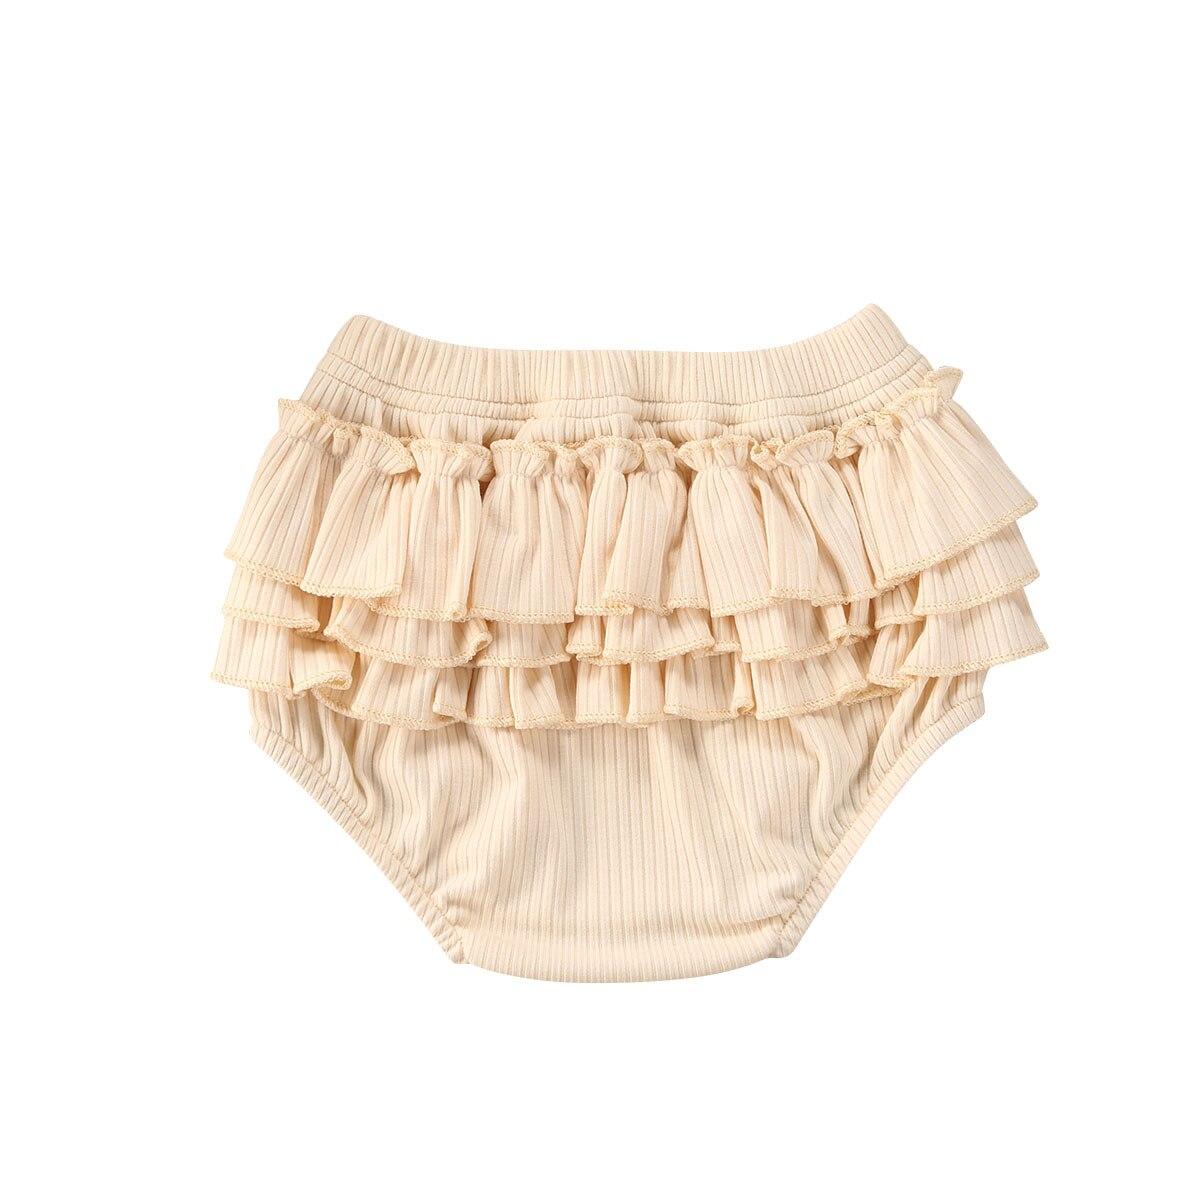 Fashion Toddler Babies Girls Boys Shorts Infant Baby Fold Bloomers Girls Pattern Shorts Toddler Ruffled Ribbed Trousers Pants